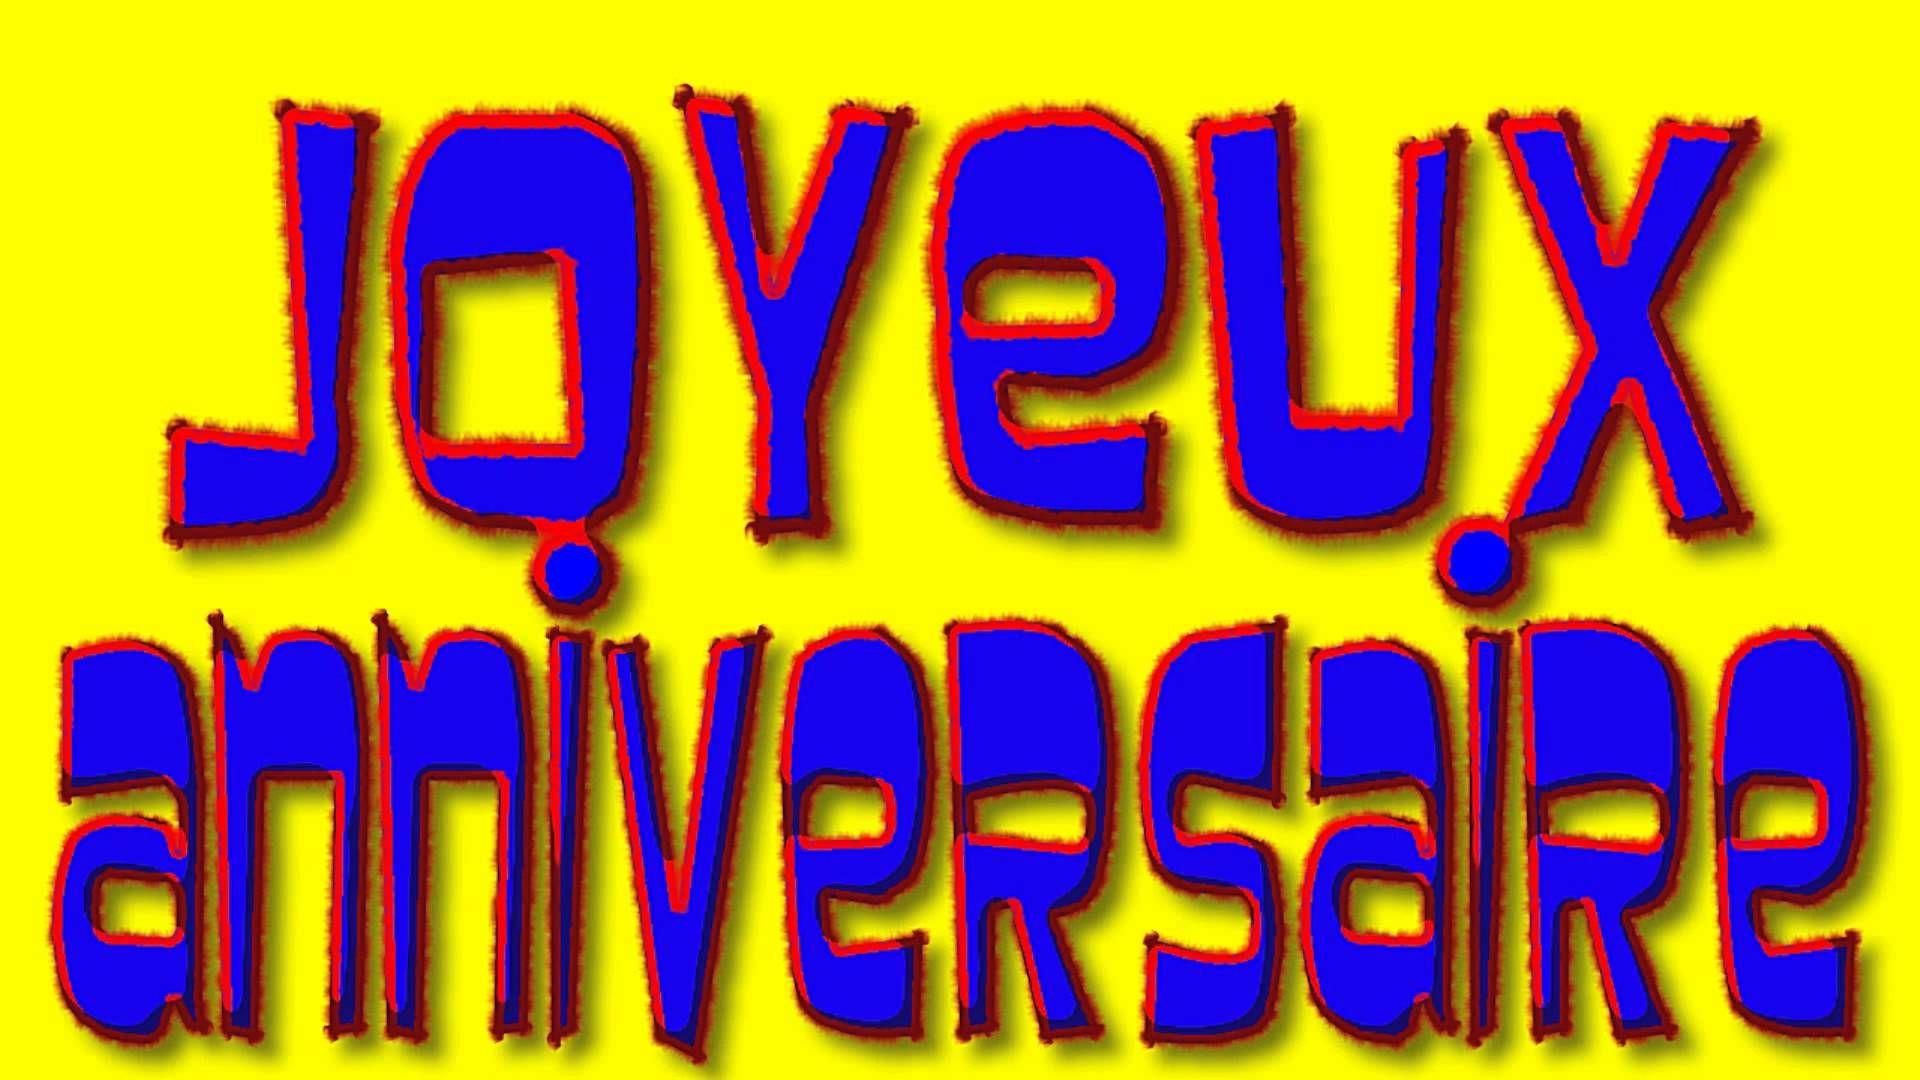 Joyeux Anniversaire (Happy Birthday in French) (avec